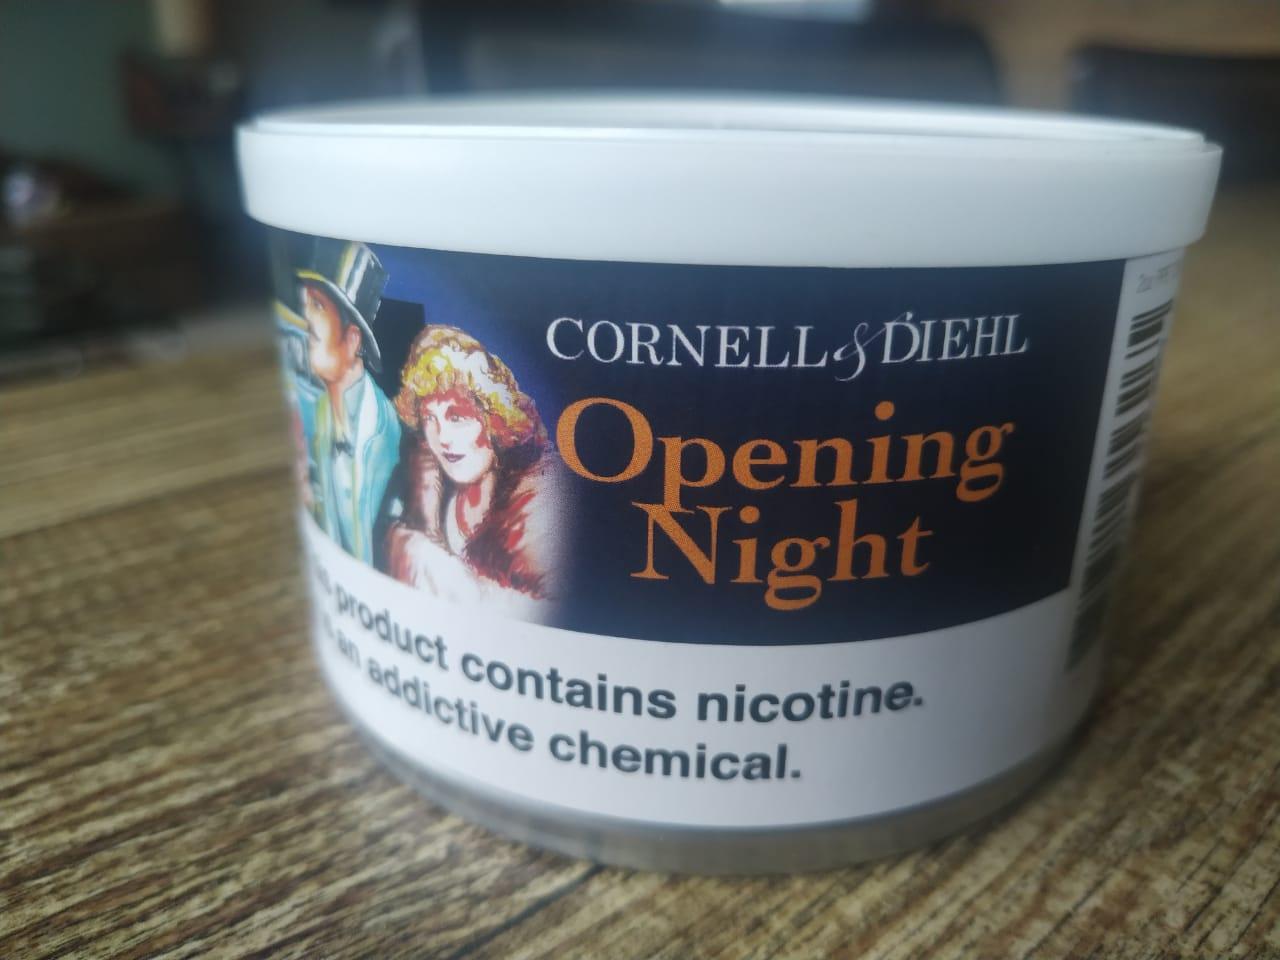 Cornell & Diehl - Opening Night